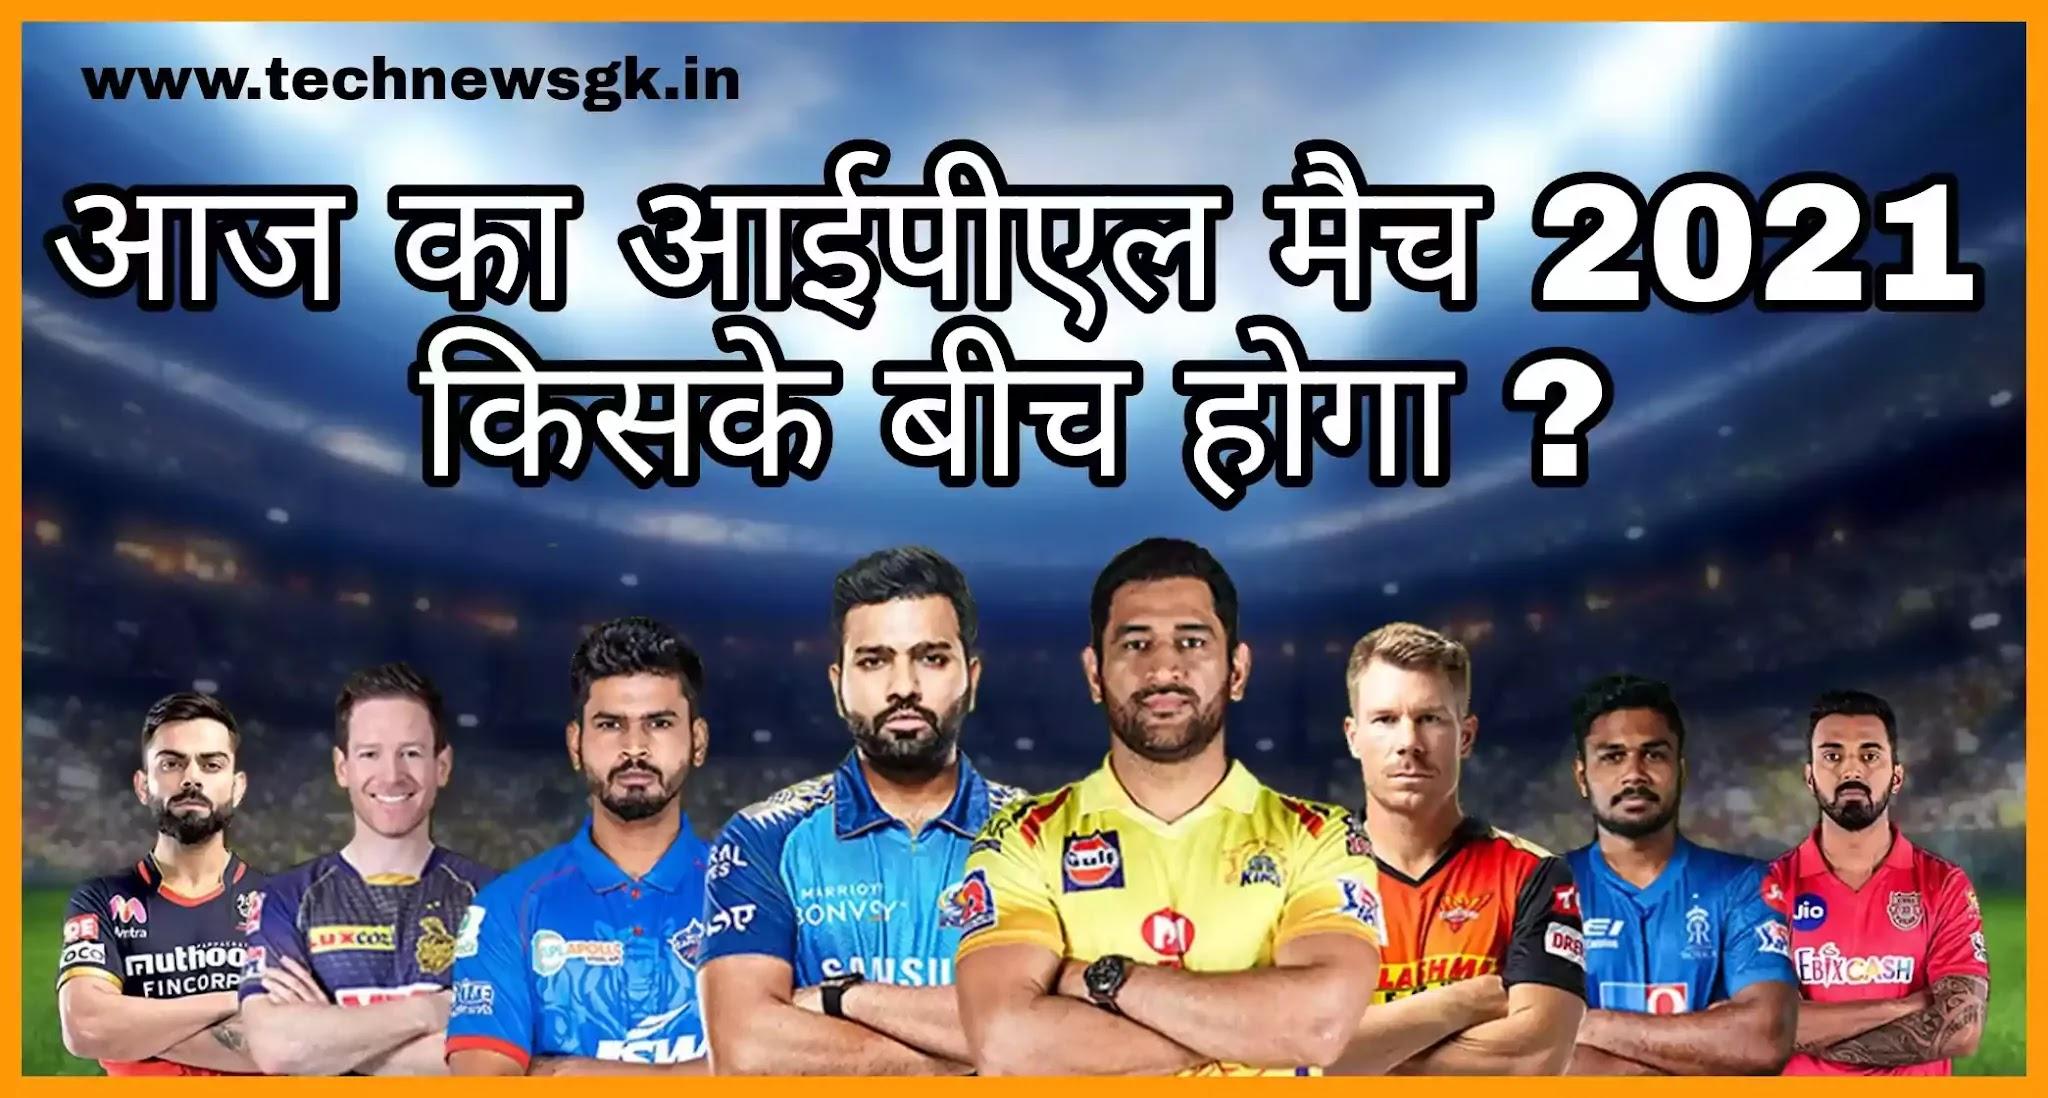 Aaj ka IPL match 2021